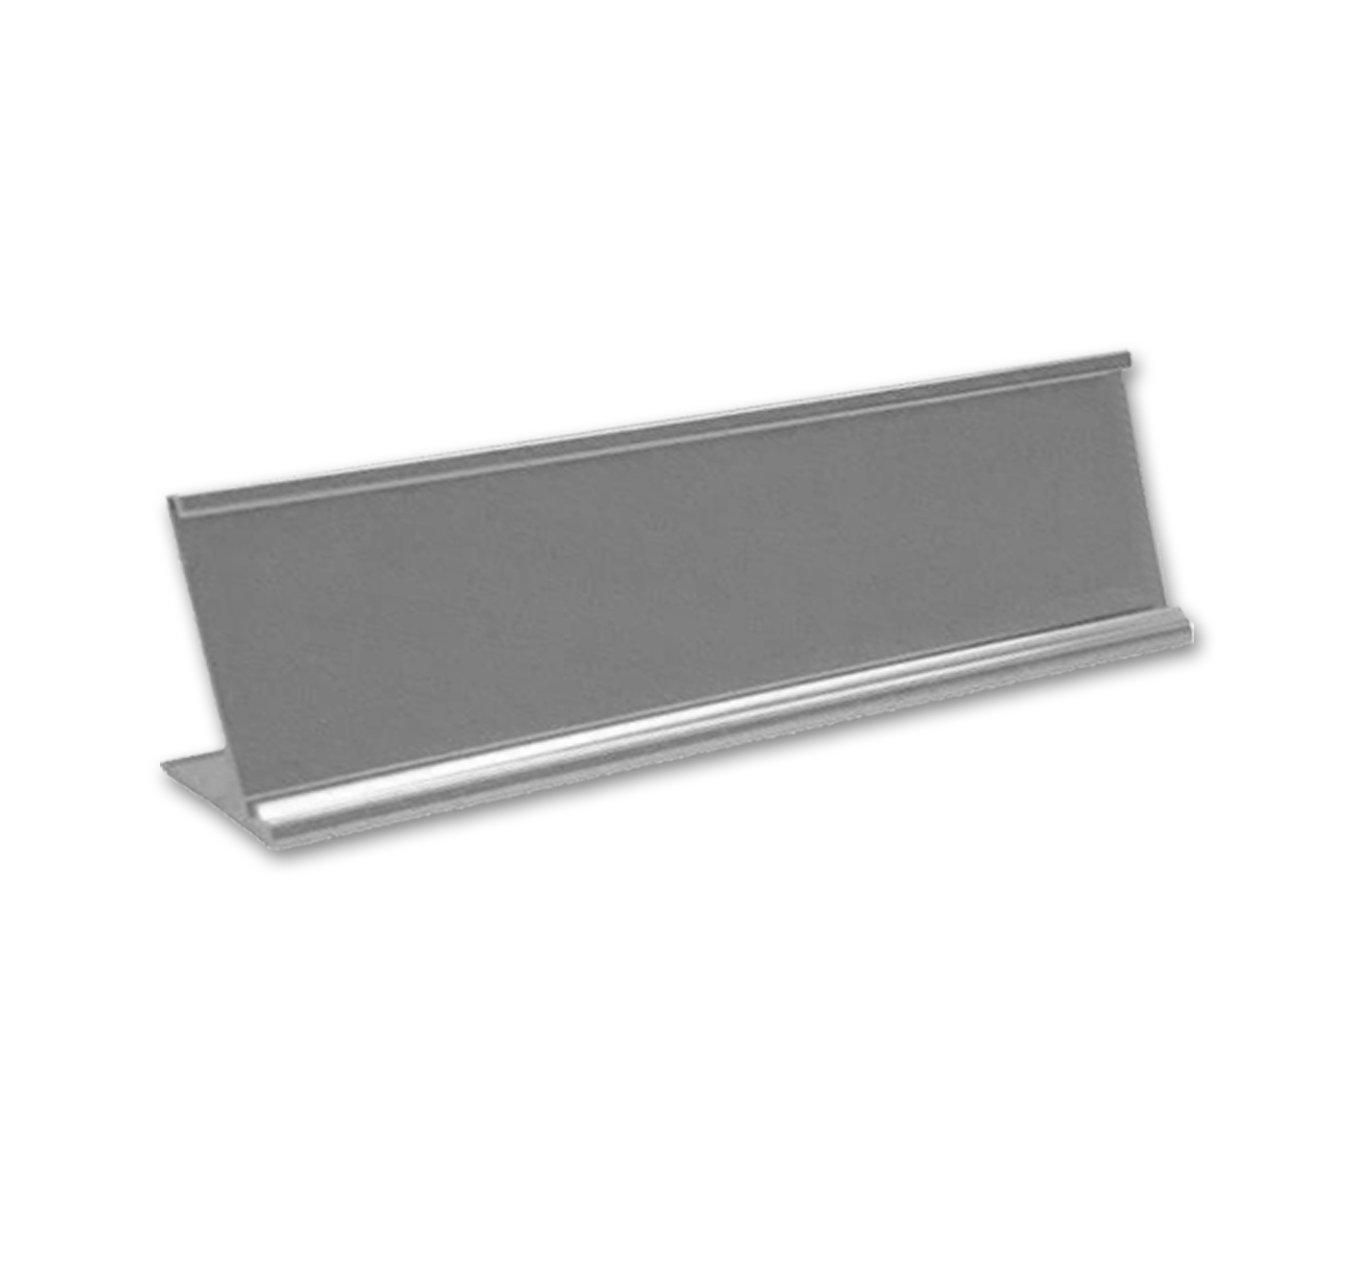 Quality Satin Aluminum Desktop Office Nameplate Holder, 10'' x 2'' (1)